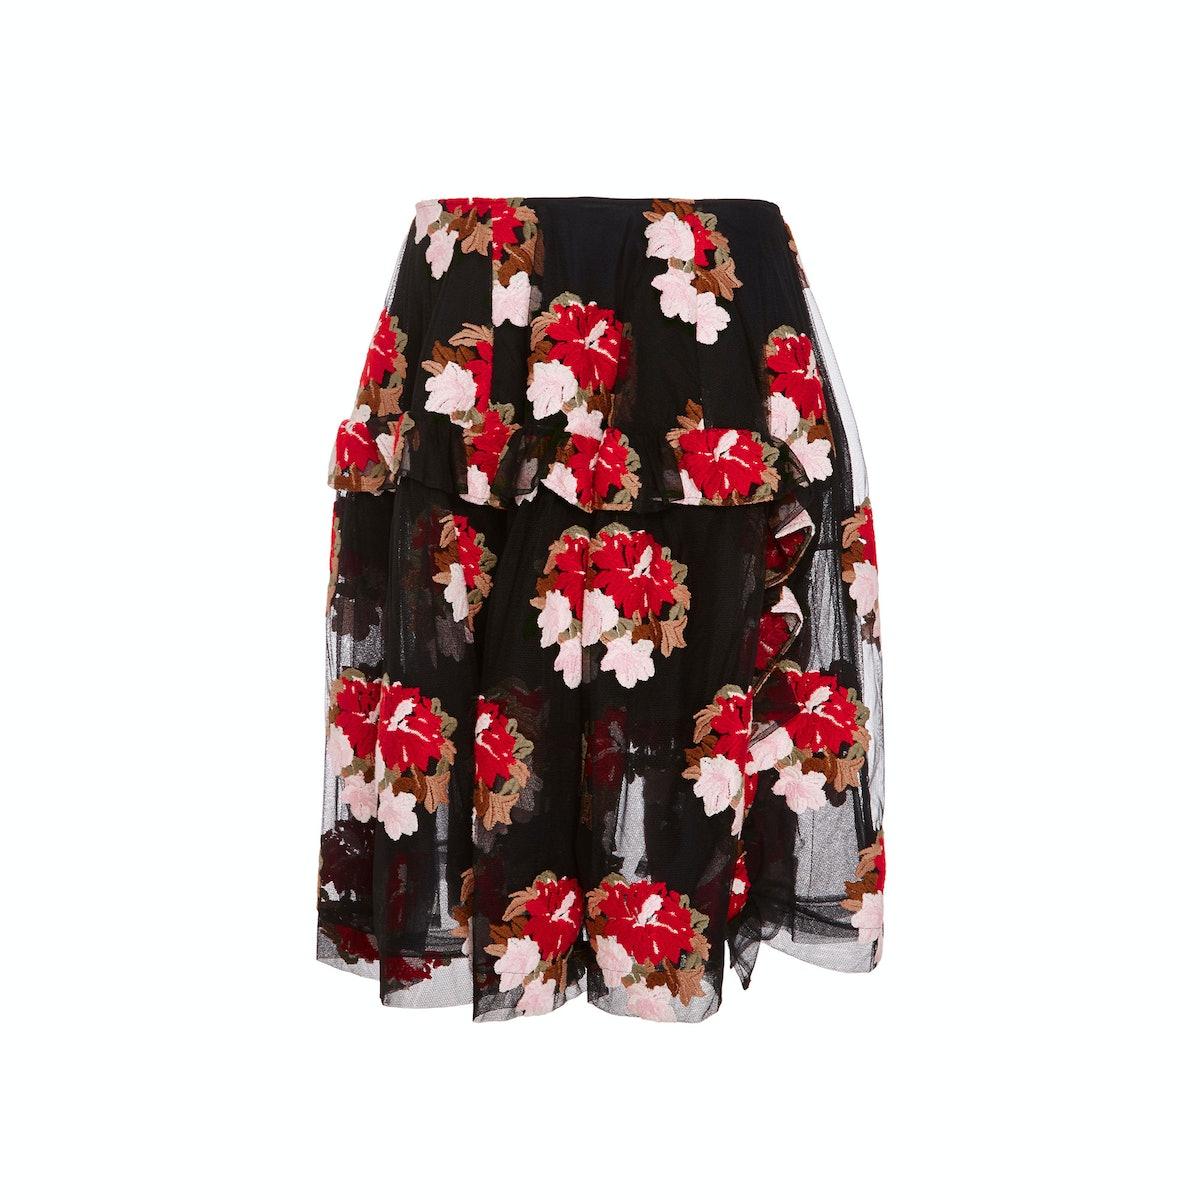 Simone Rocha skirt